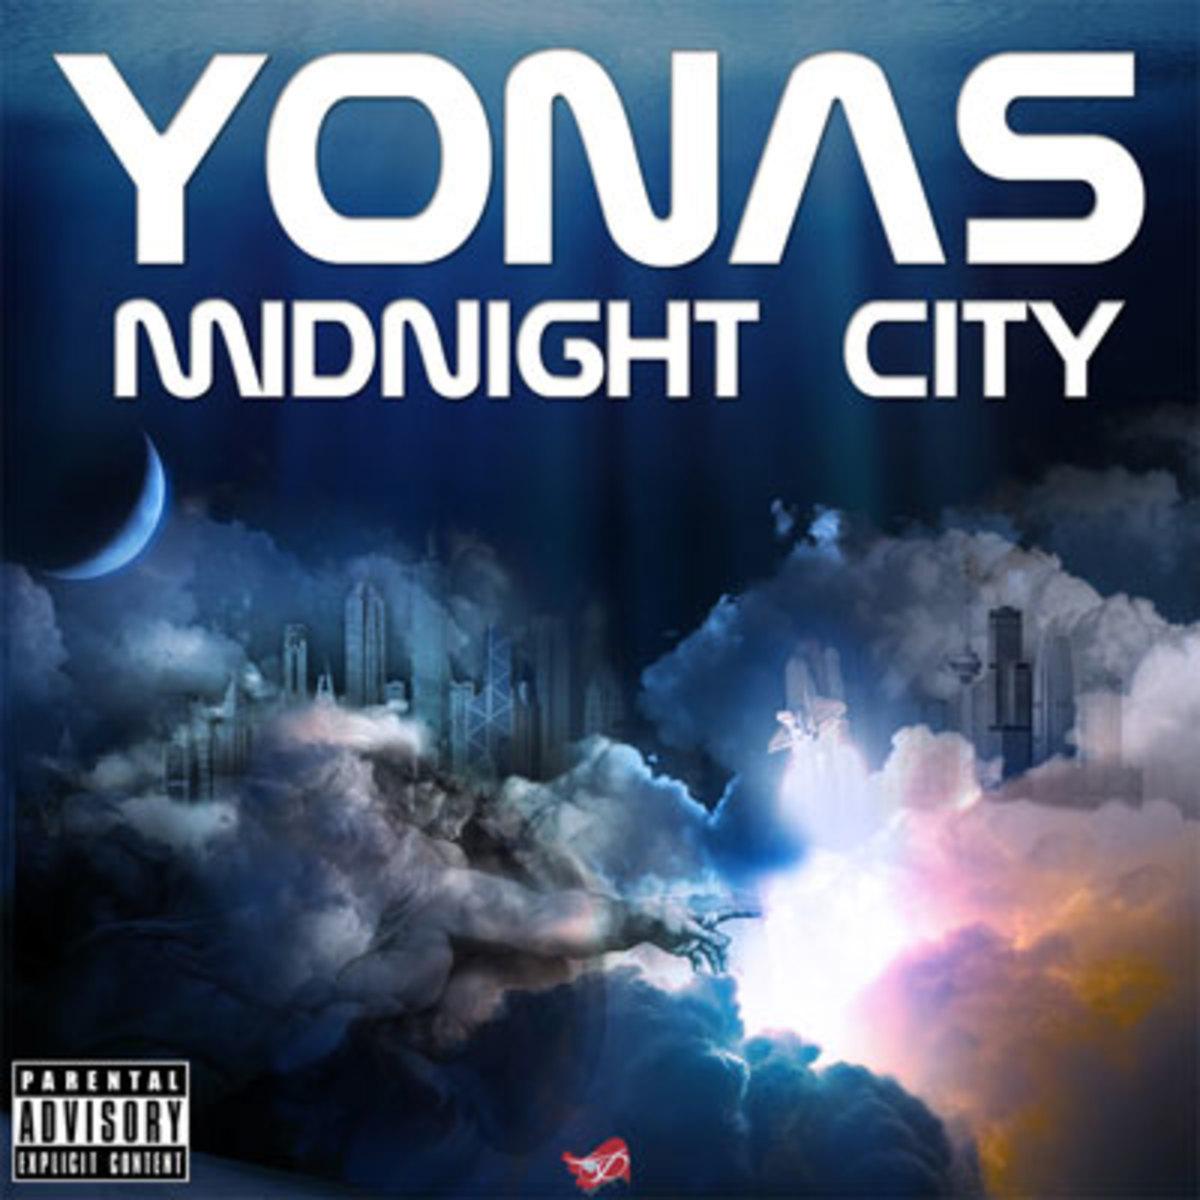 yonas-midnightcity.jpg